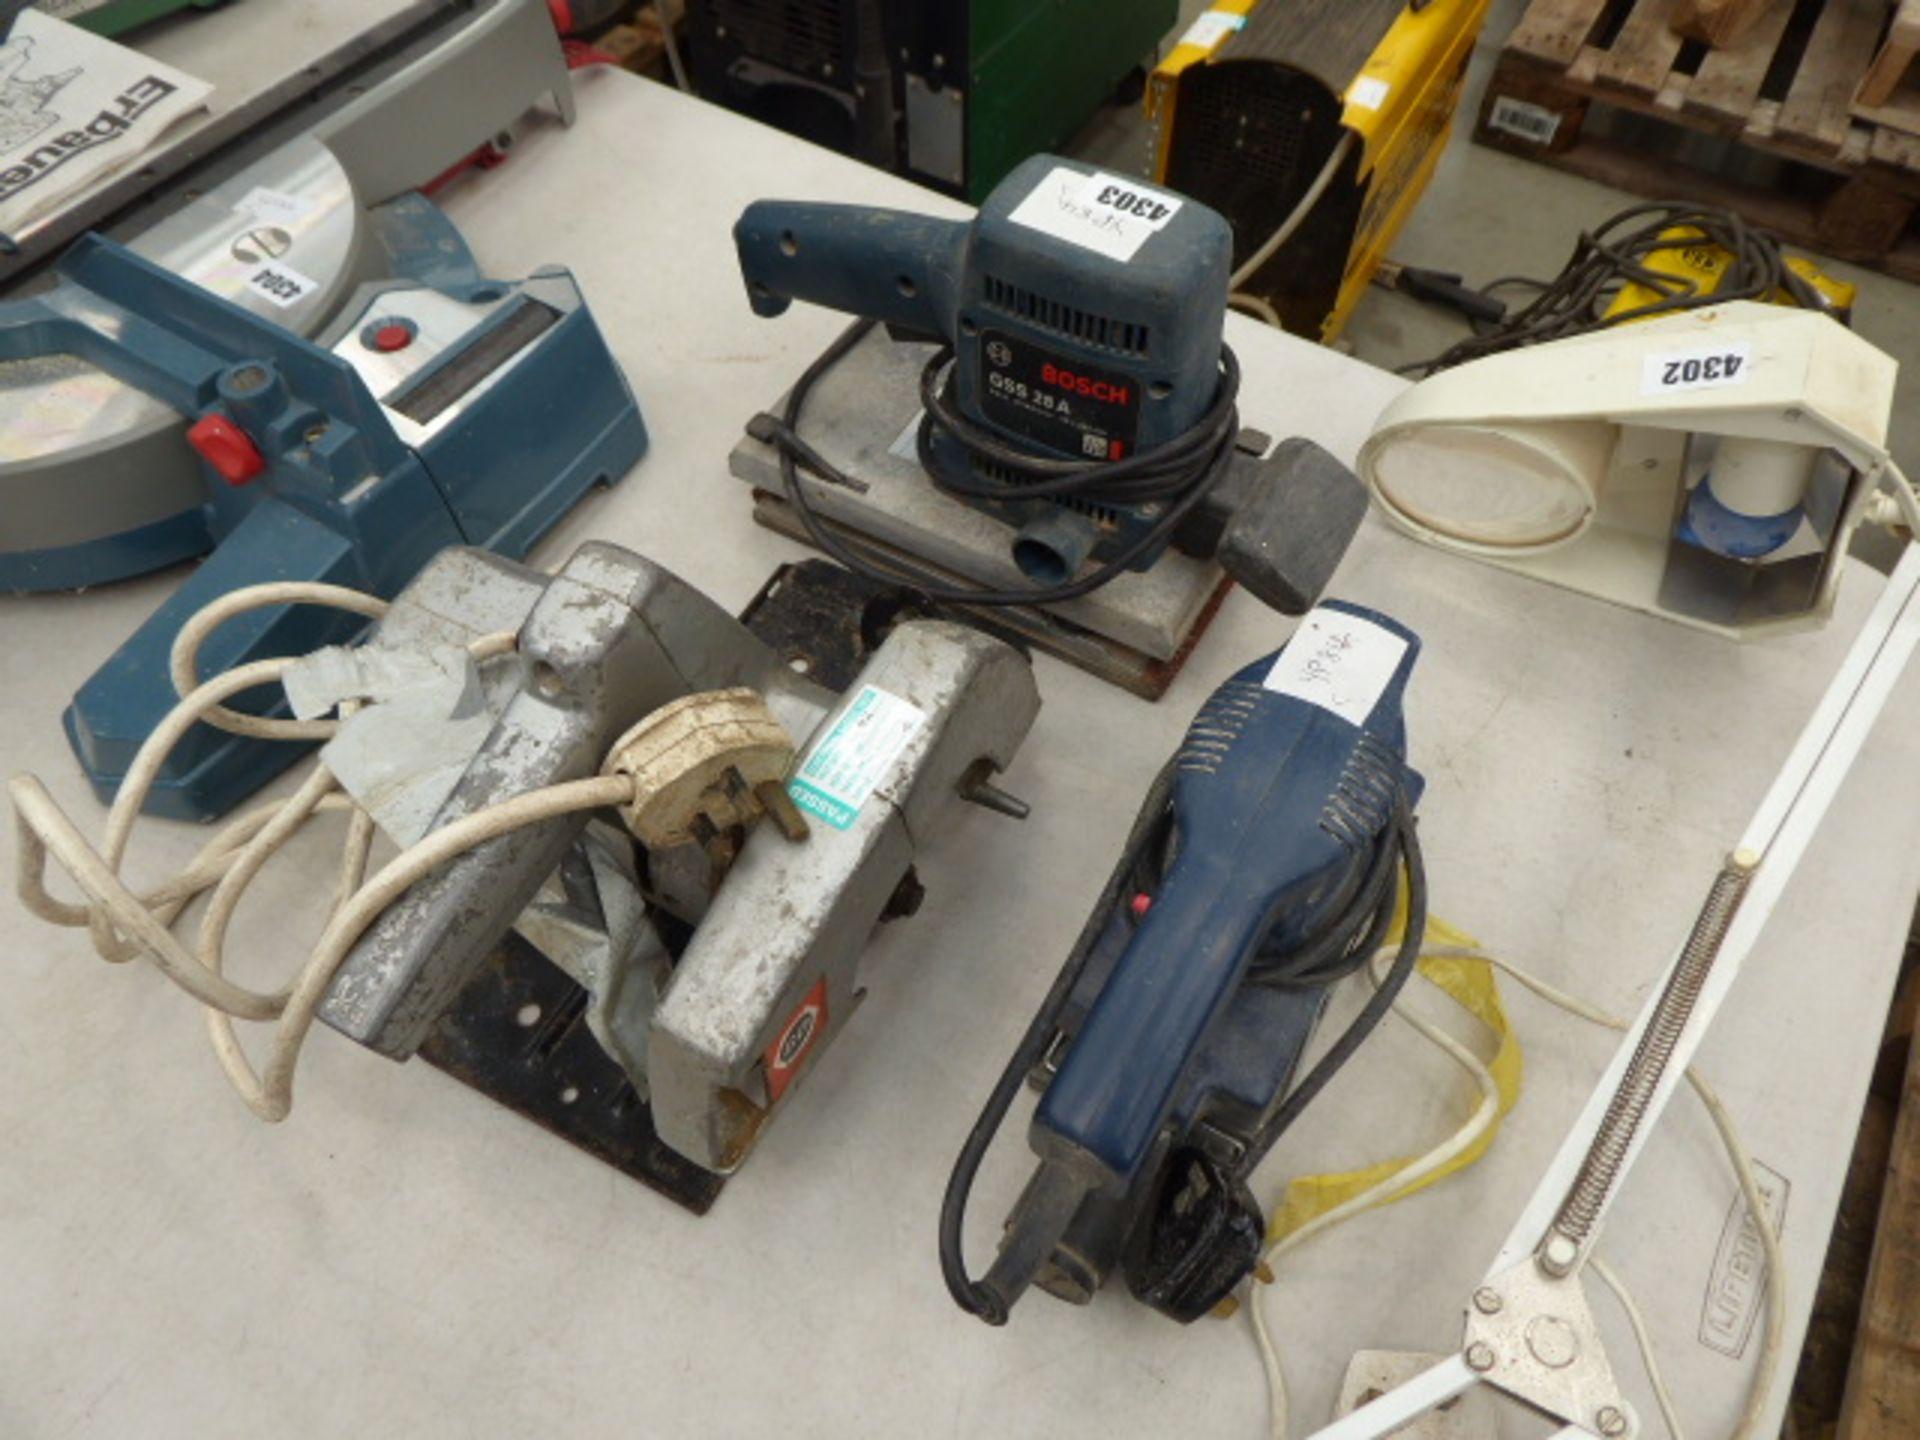 Lot 4303 - 2 sanders and a circular saw